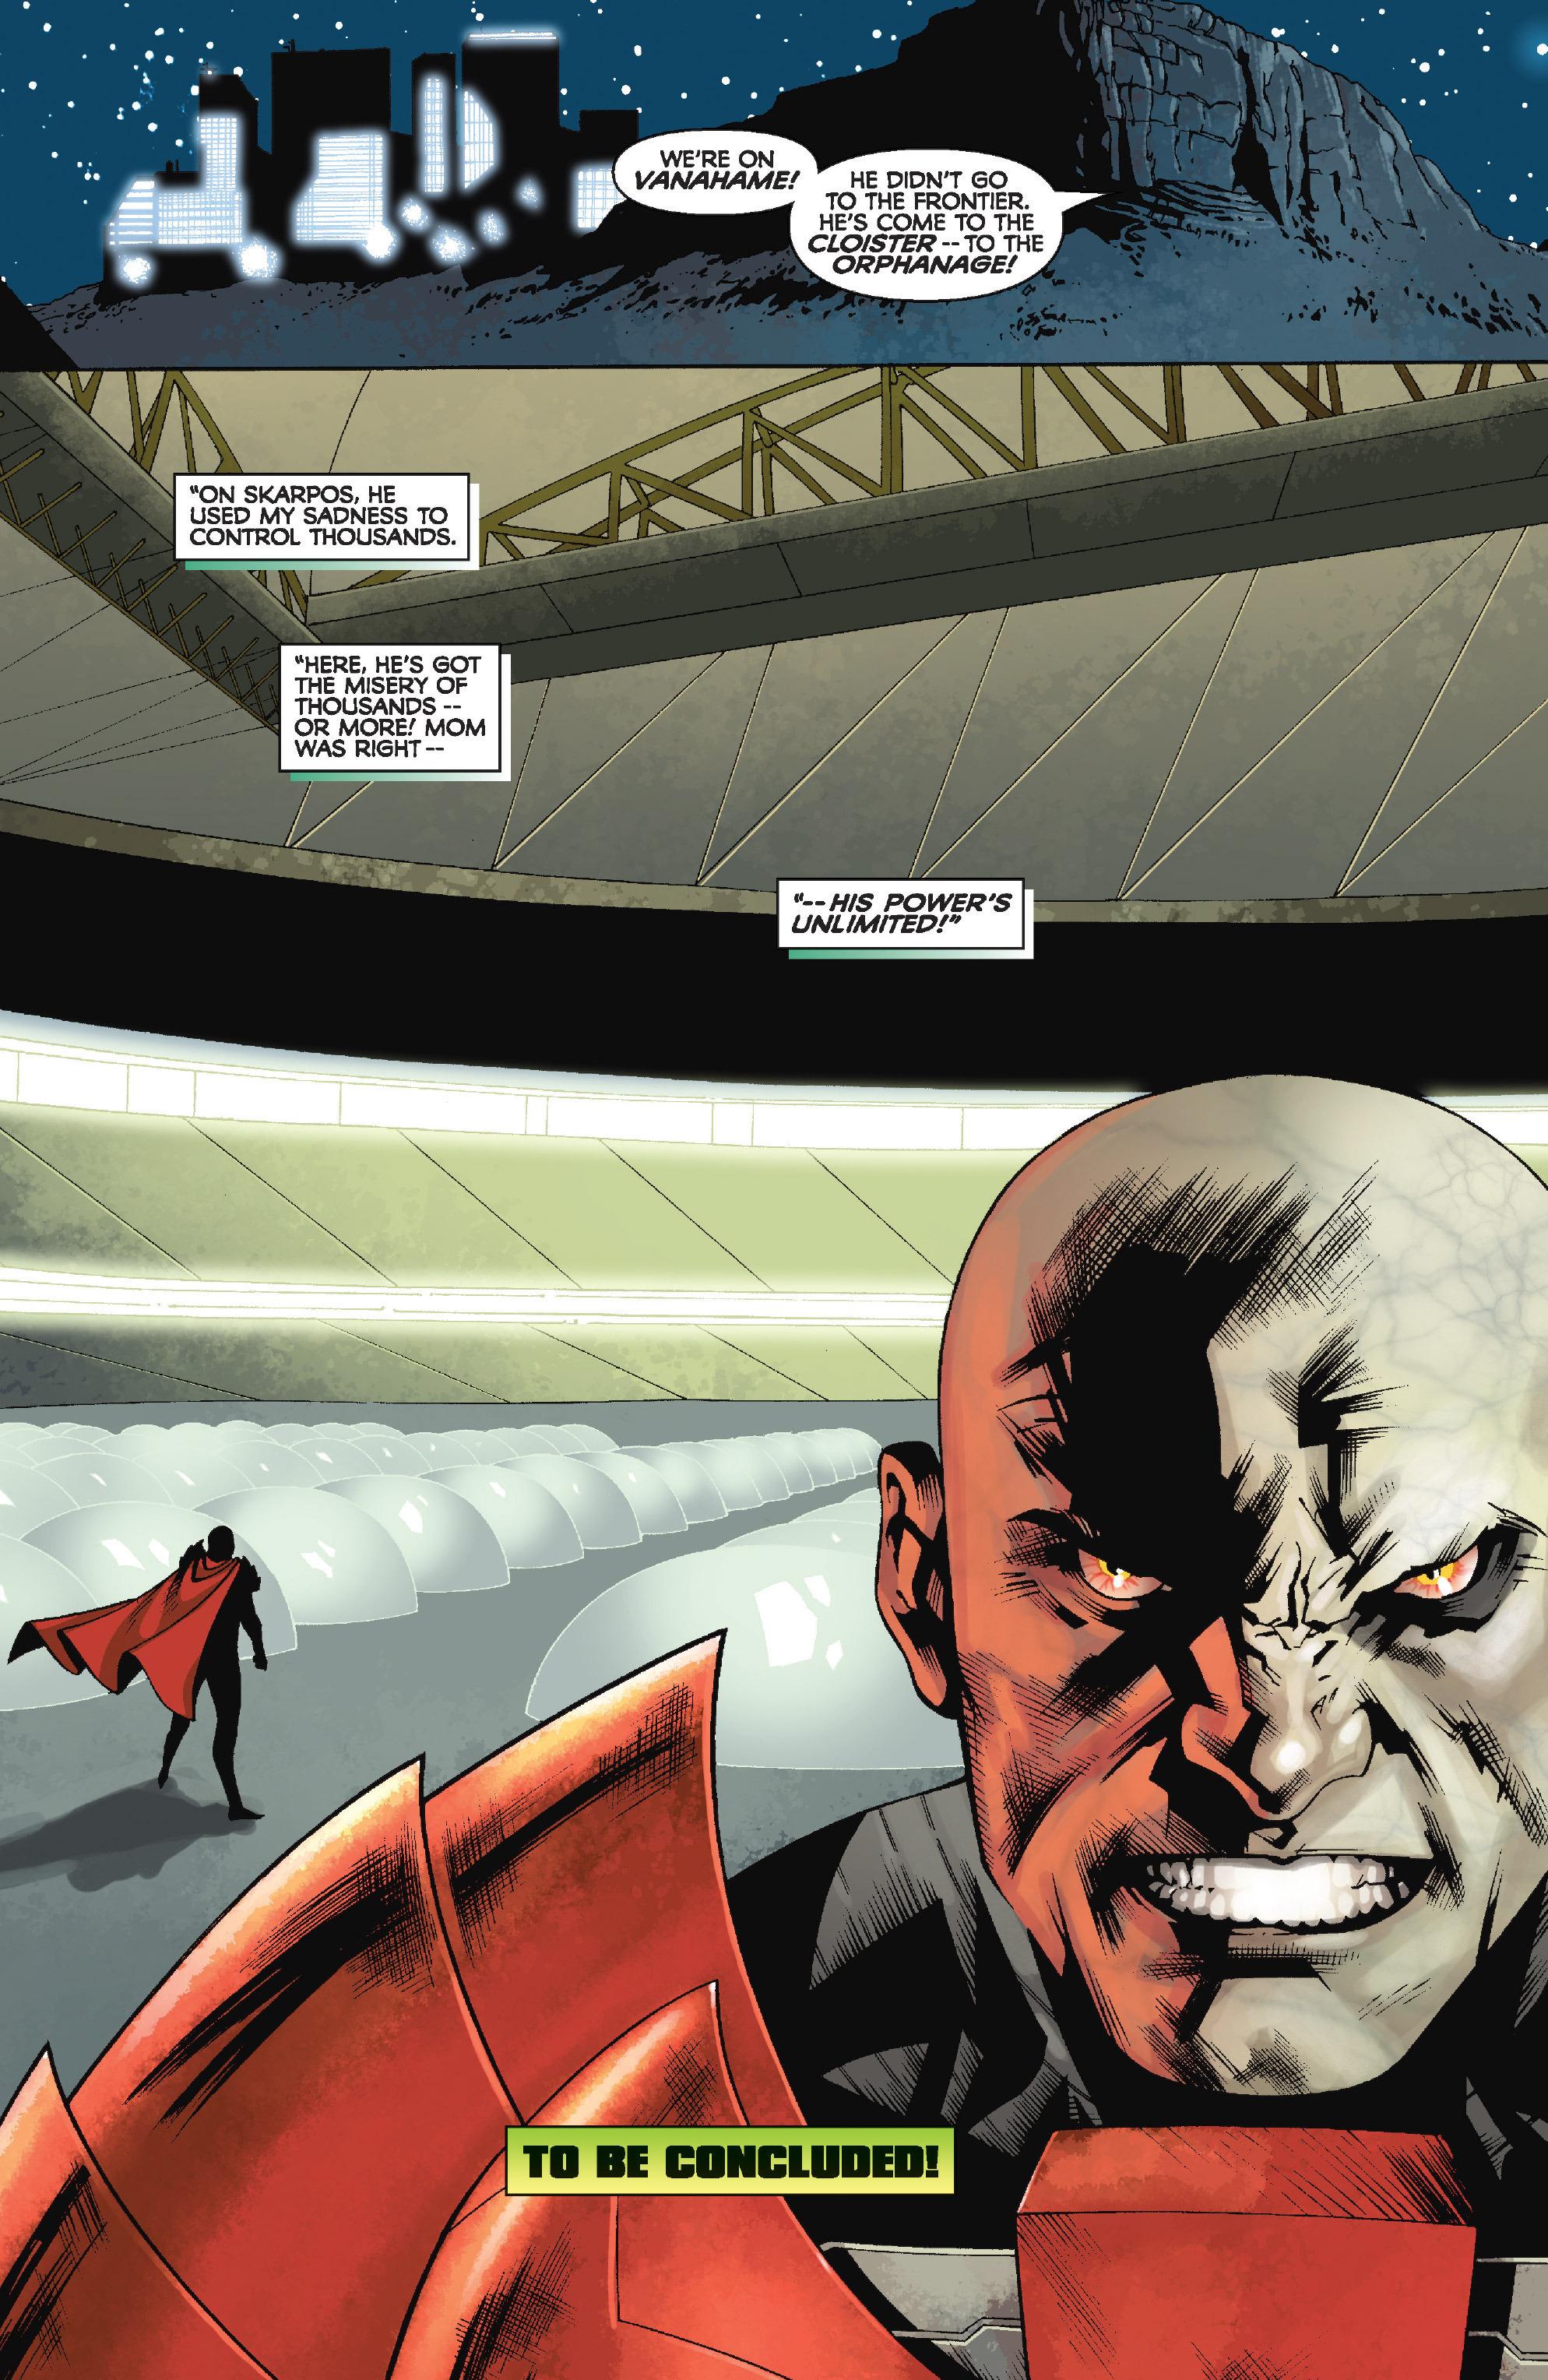 Read online Star Wars: Knight Errant - Escape comic -  Issue #4 - 24